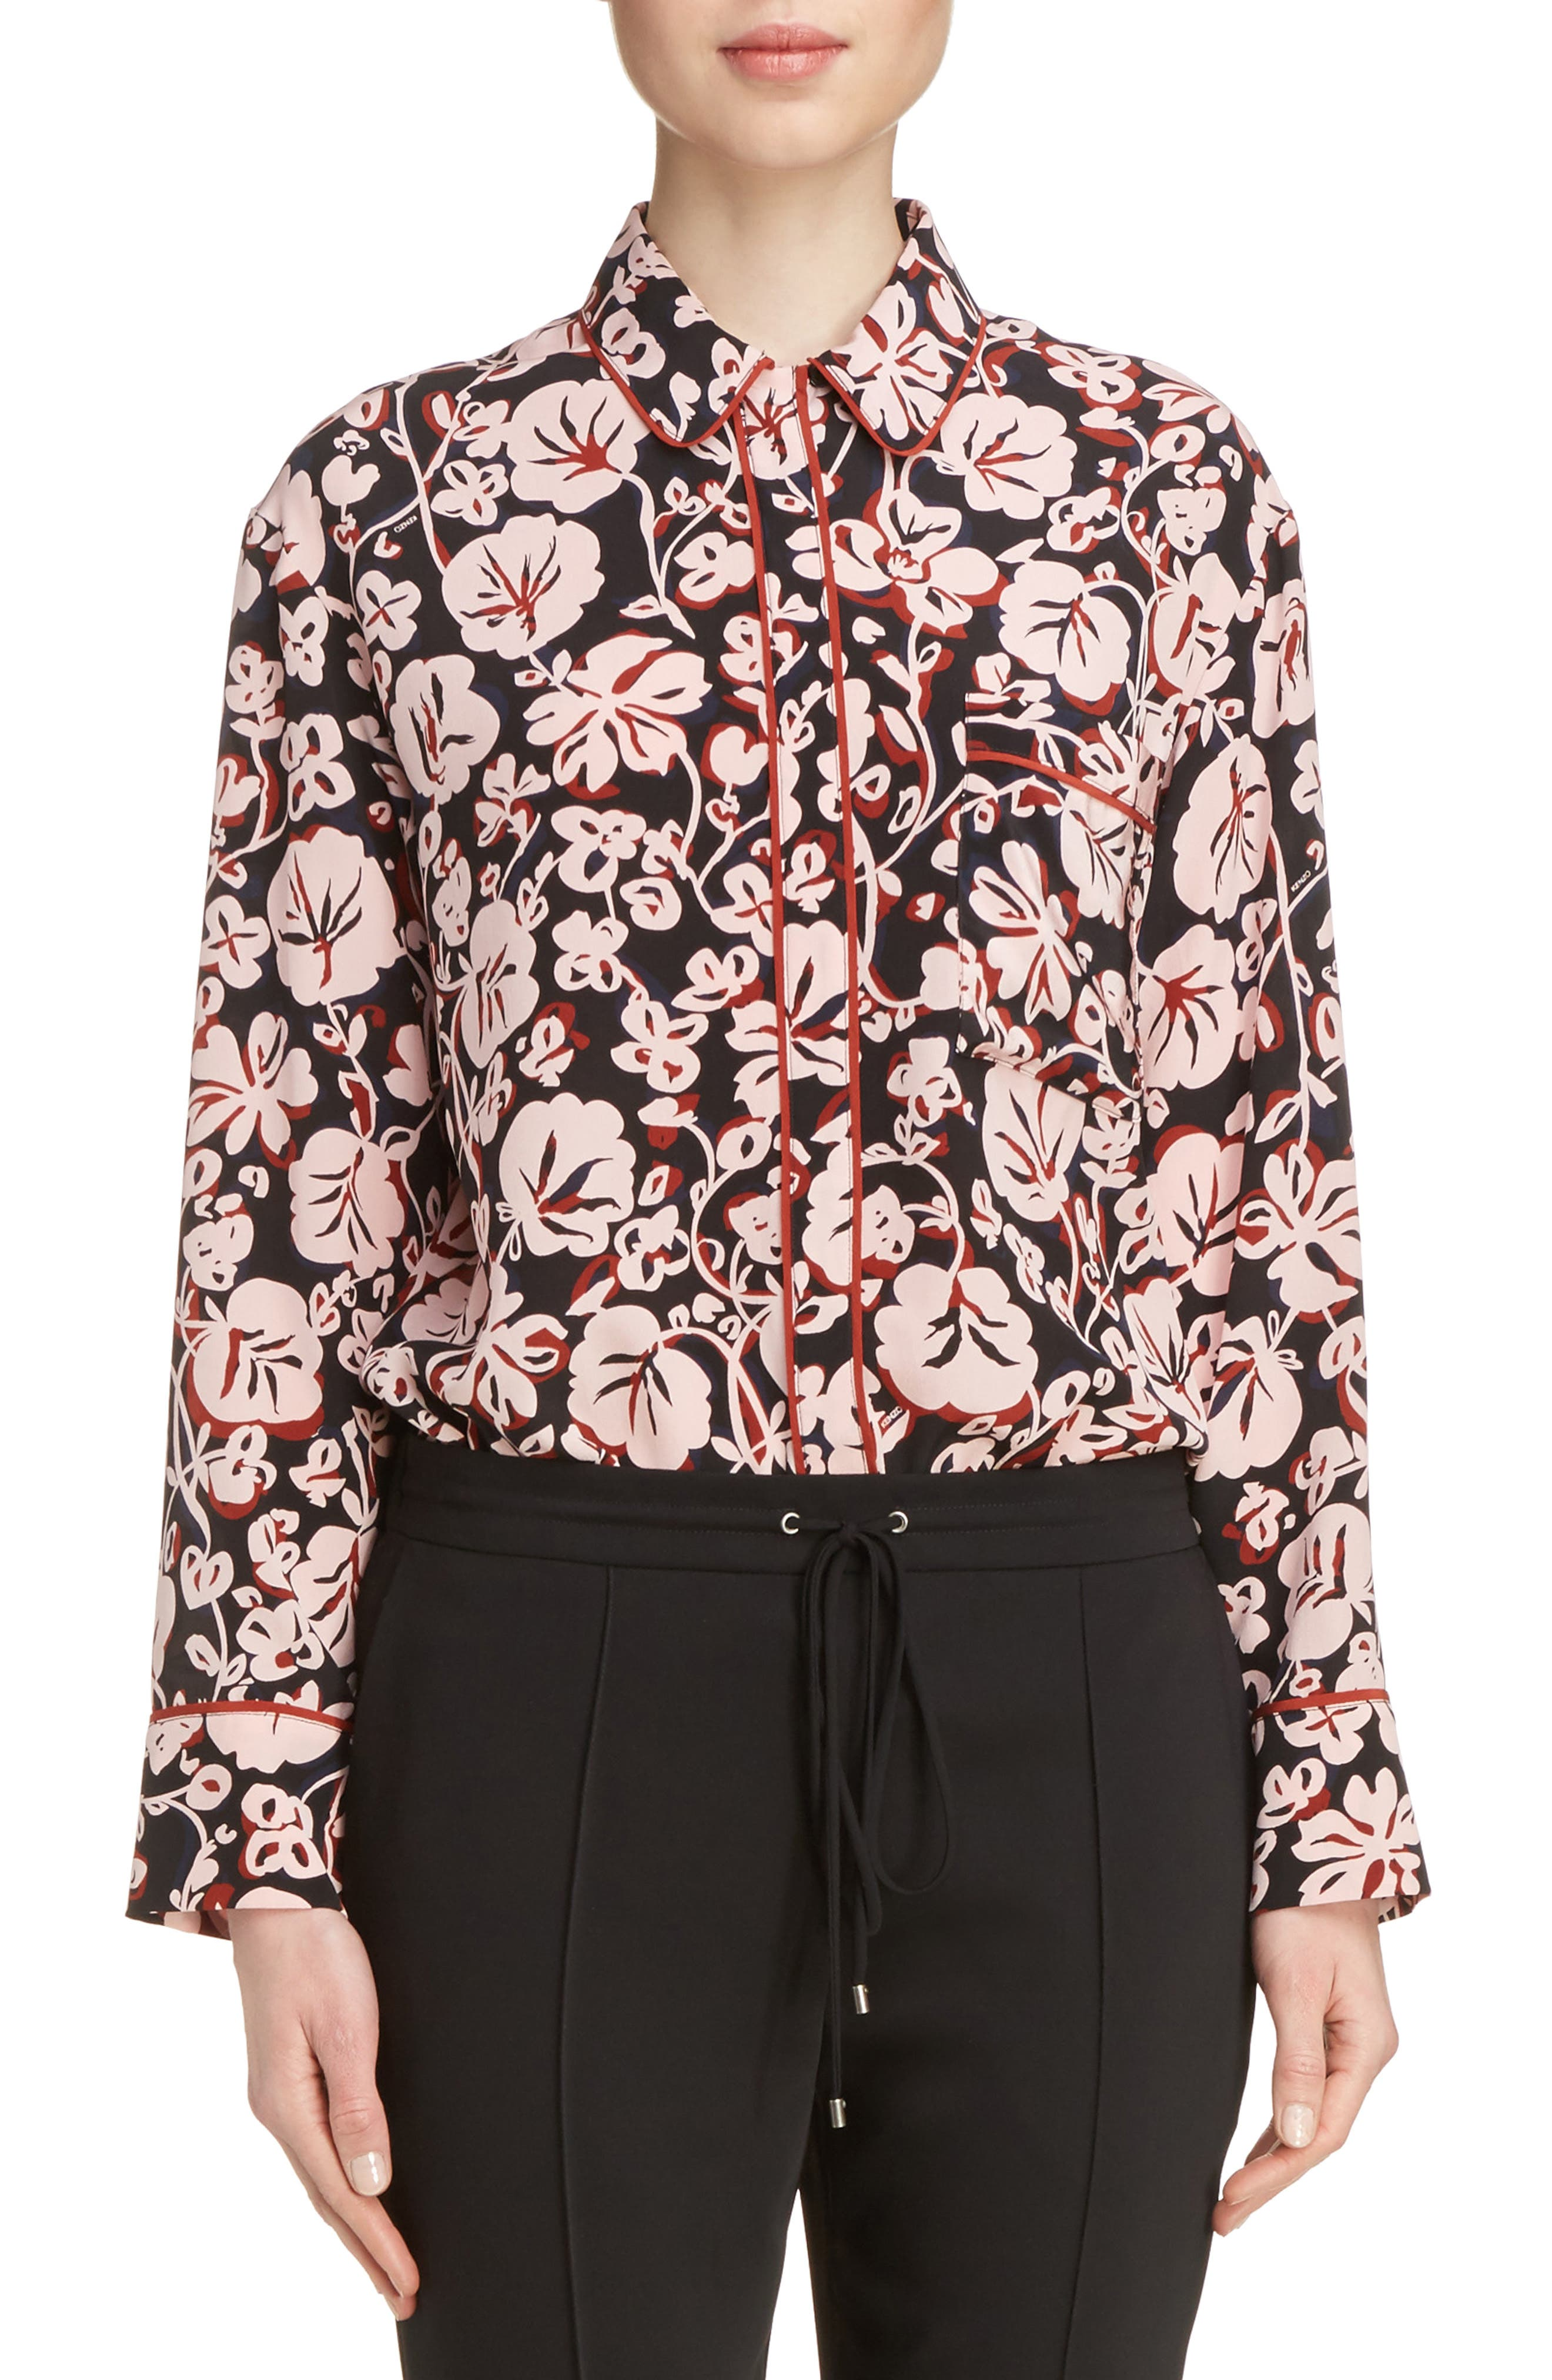 KENZO Floral Print Silk Shirt